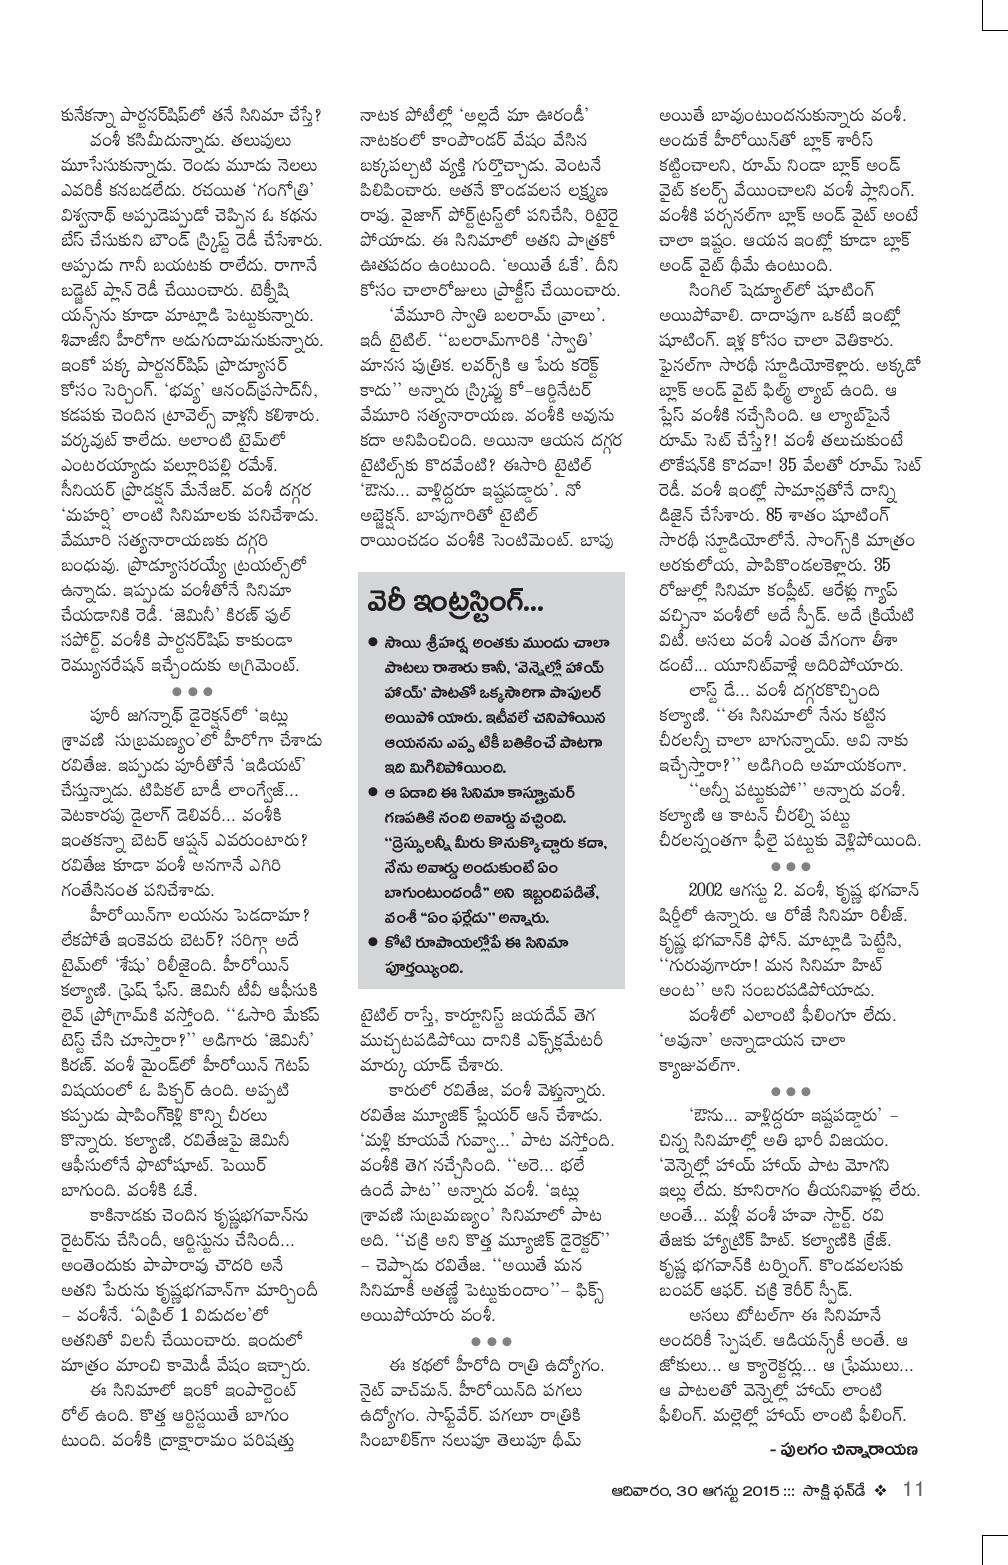 Cinema Venuka Story_Avunu Valliddaru Istapaddaru_Funday (30-08-2015)-page-002